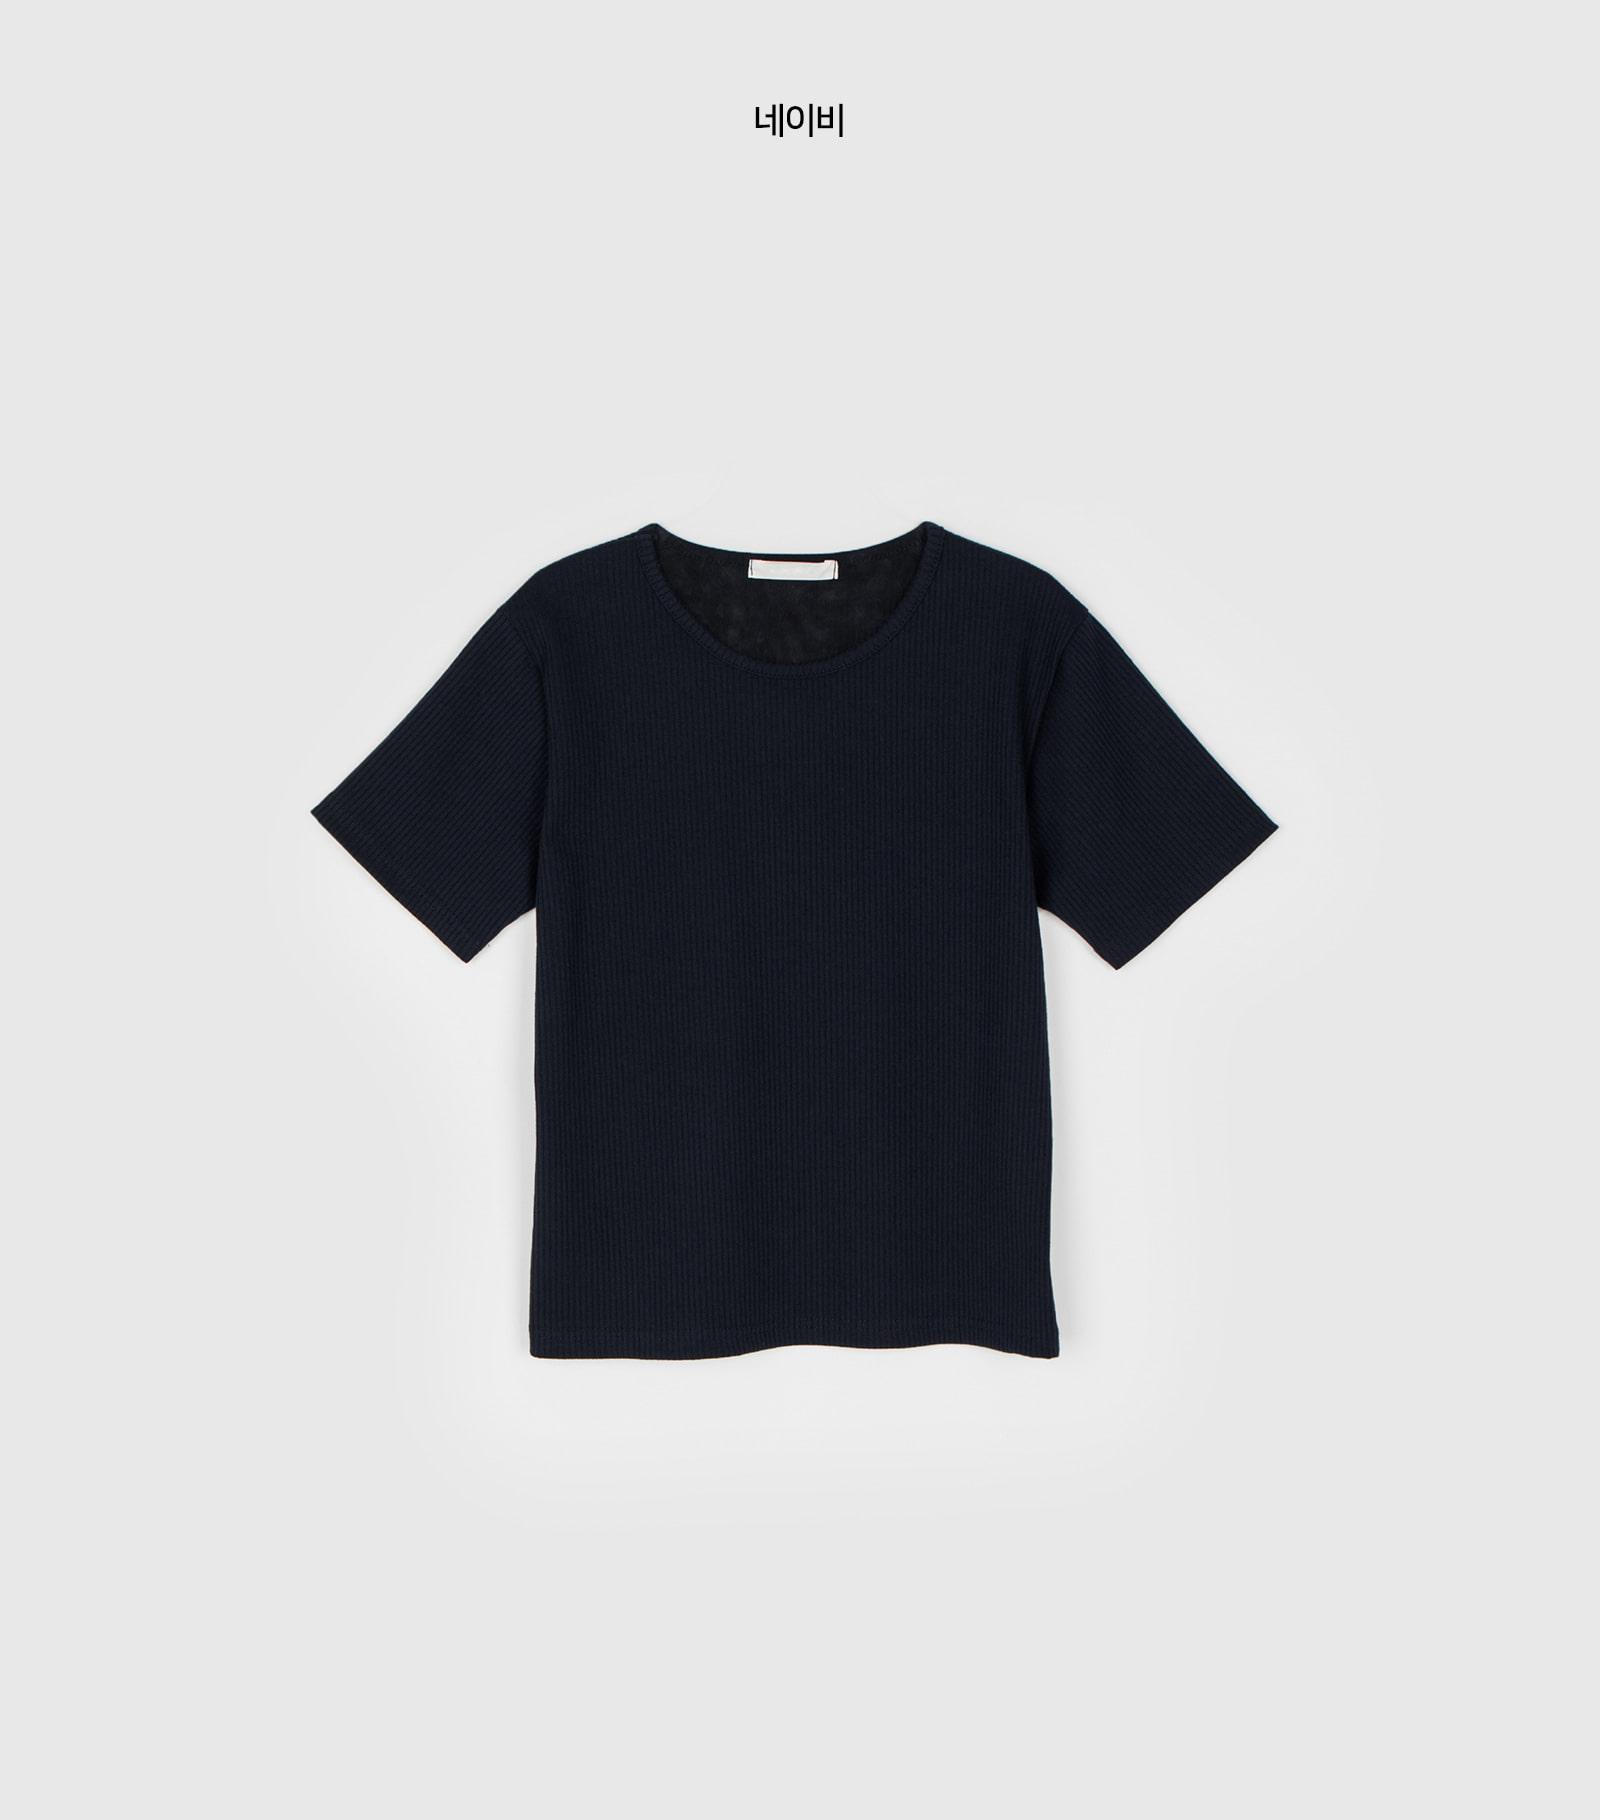 Stiff ribbed half-round neck T-shirt